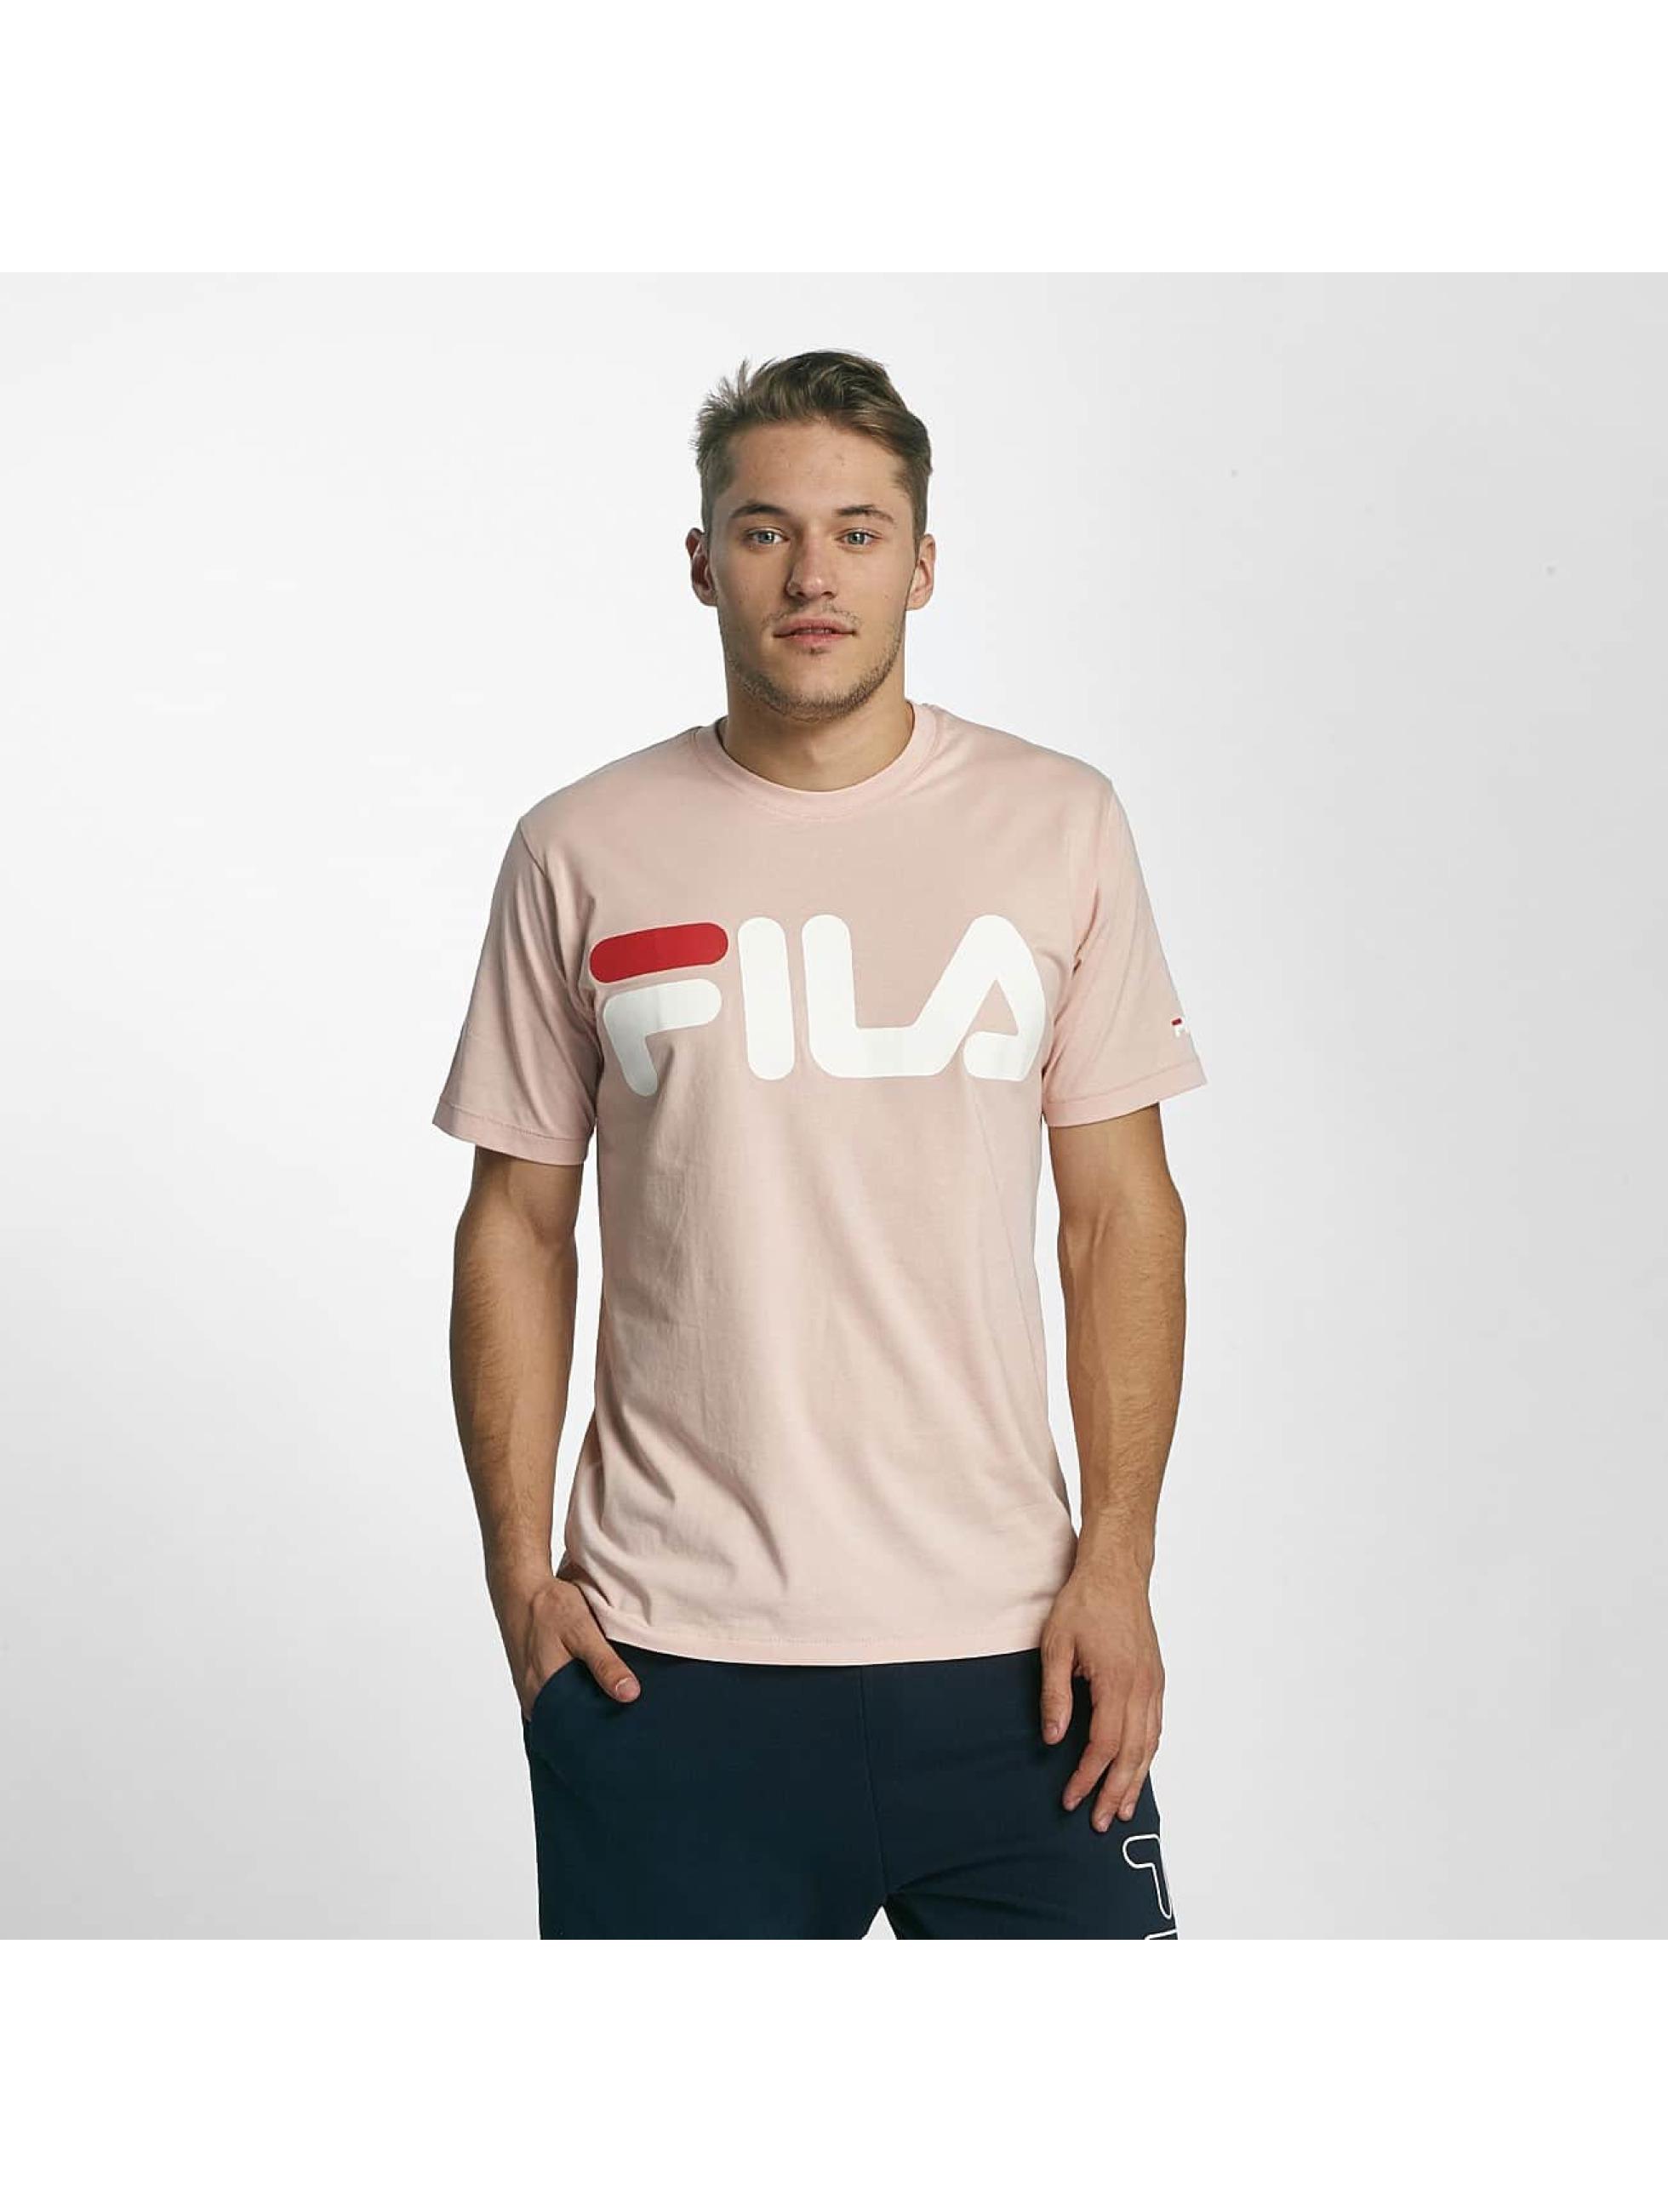 fila urban line classic logo rose homme t shirt fila acheter pas cher haut 381704. Black Bedroom Furniture Sets. Home Design Ideas